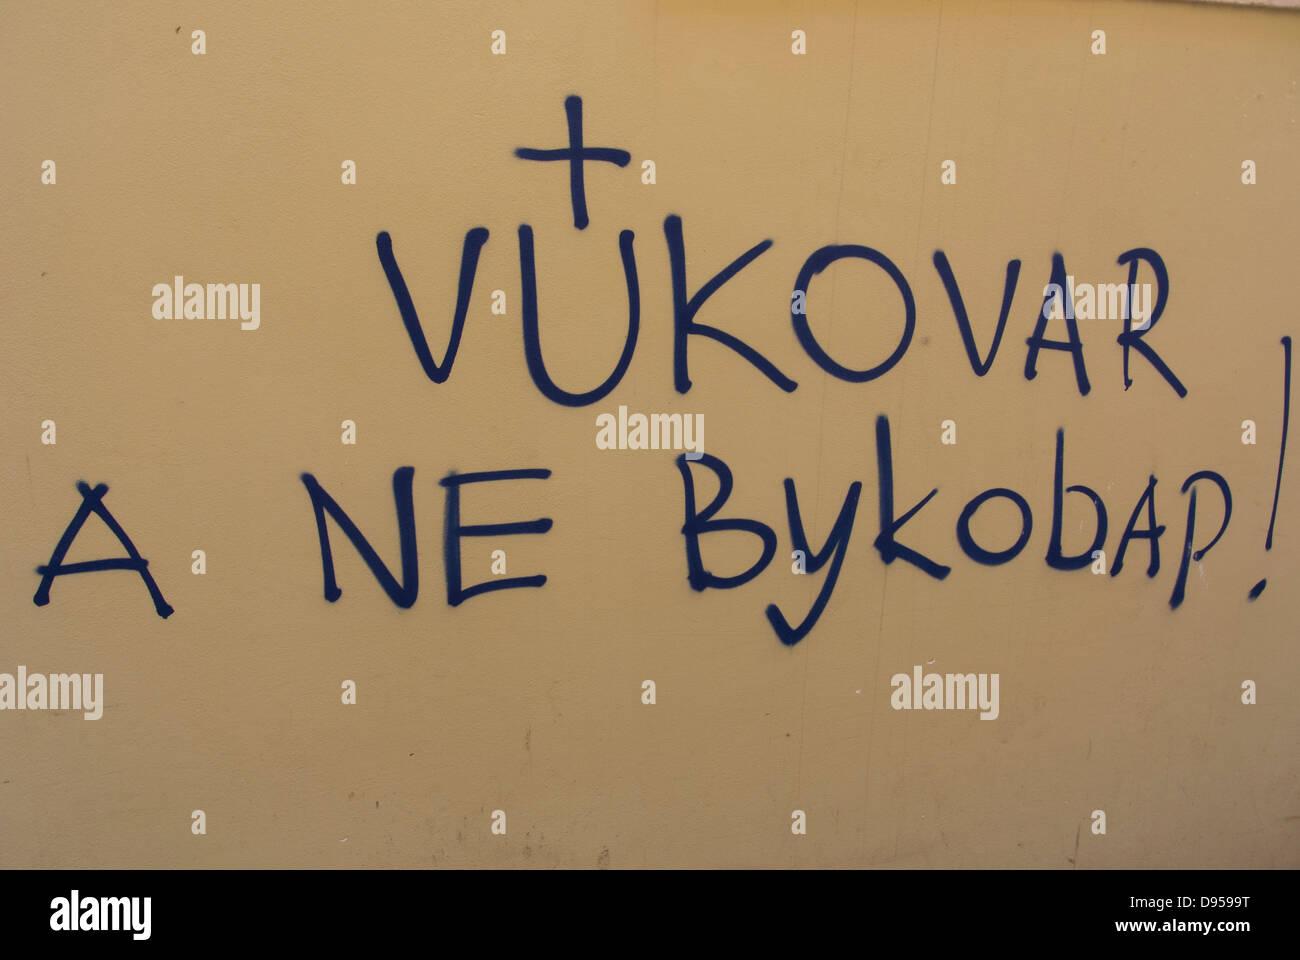 Graffiti against cirillic alphabet in Vukovar, on the wall in Zagreb city center, Croatia, Europe - Stock Image